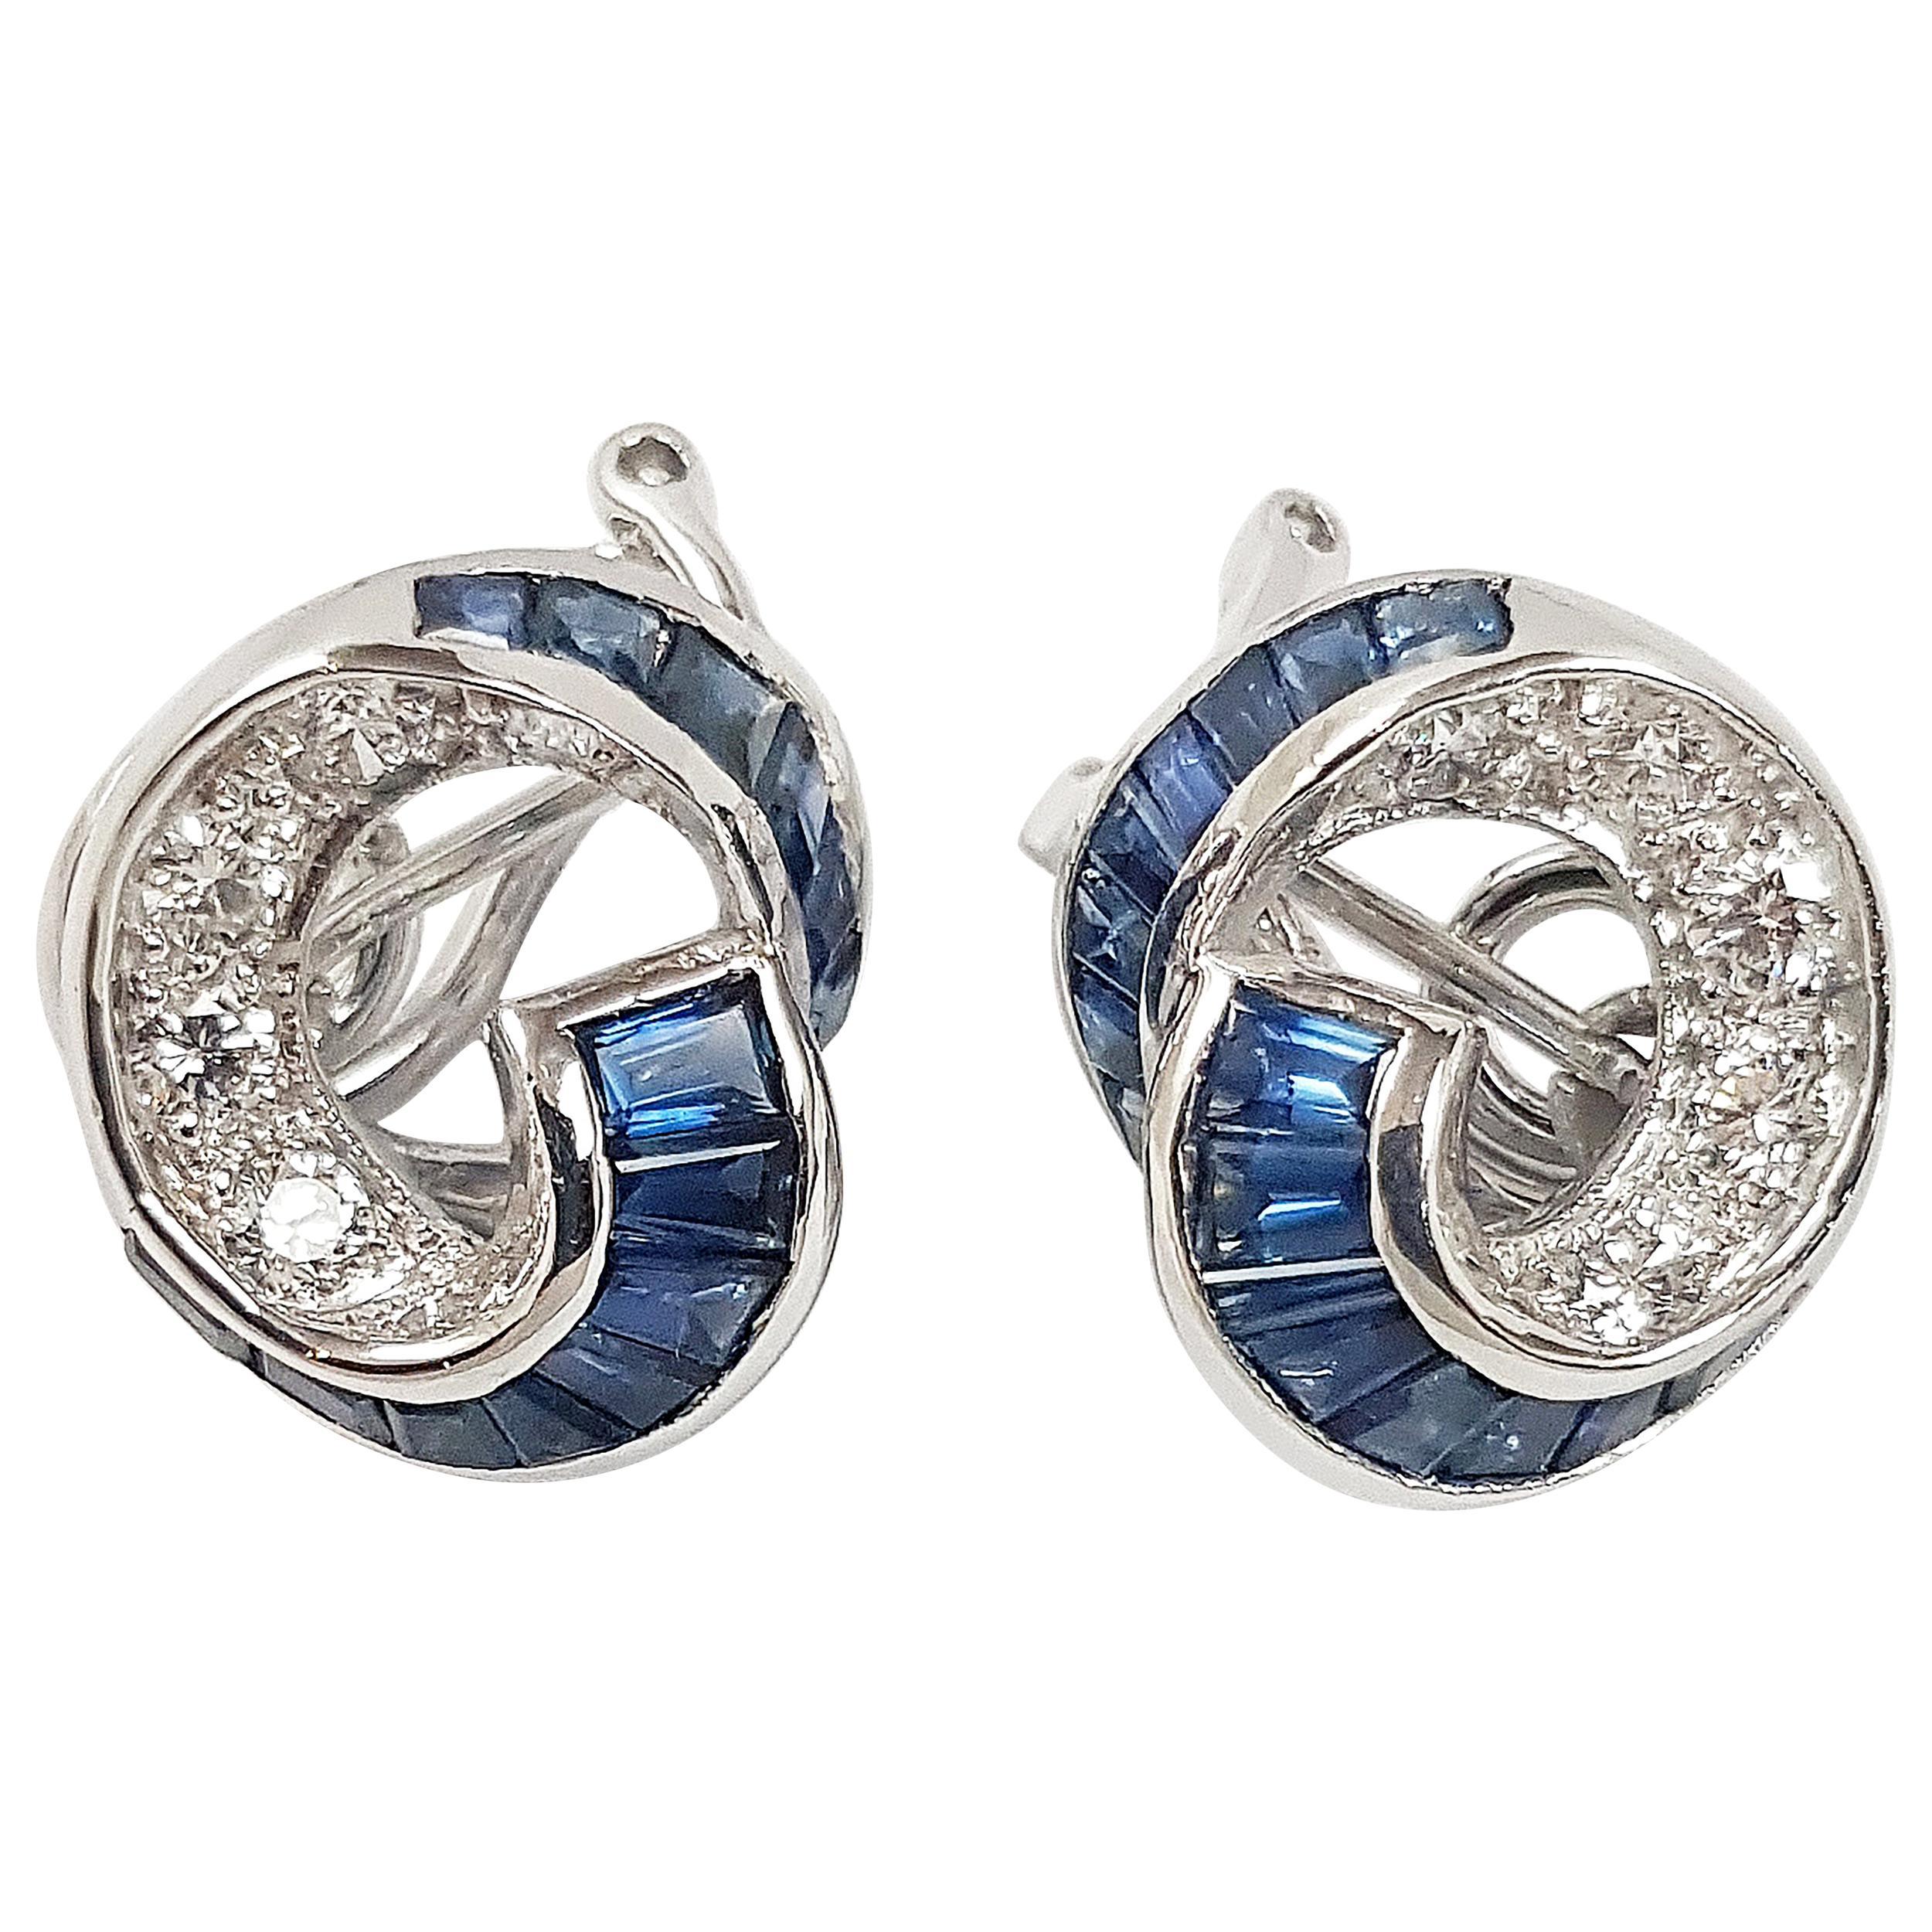 Blue Sapphire with Diamond Earrings Set in 18 Karat White Gold Setting